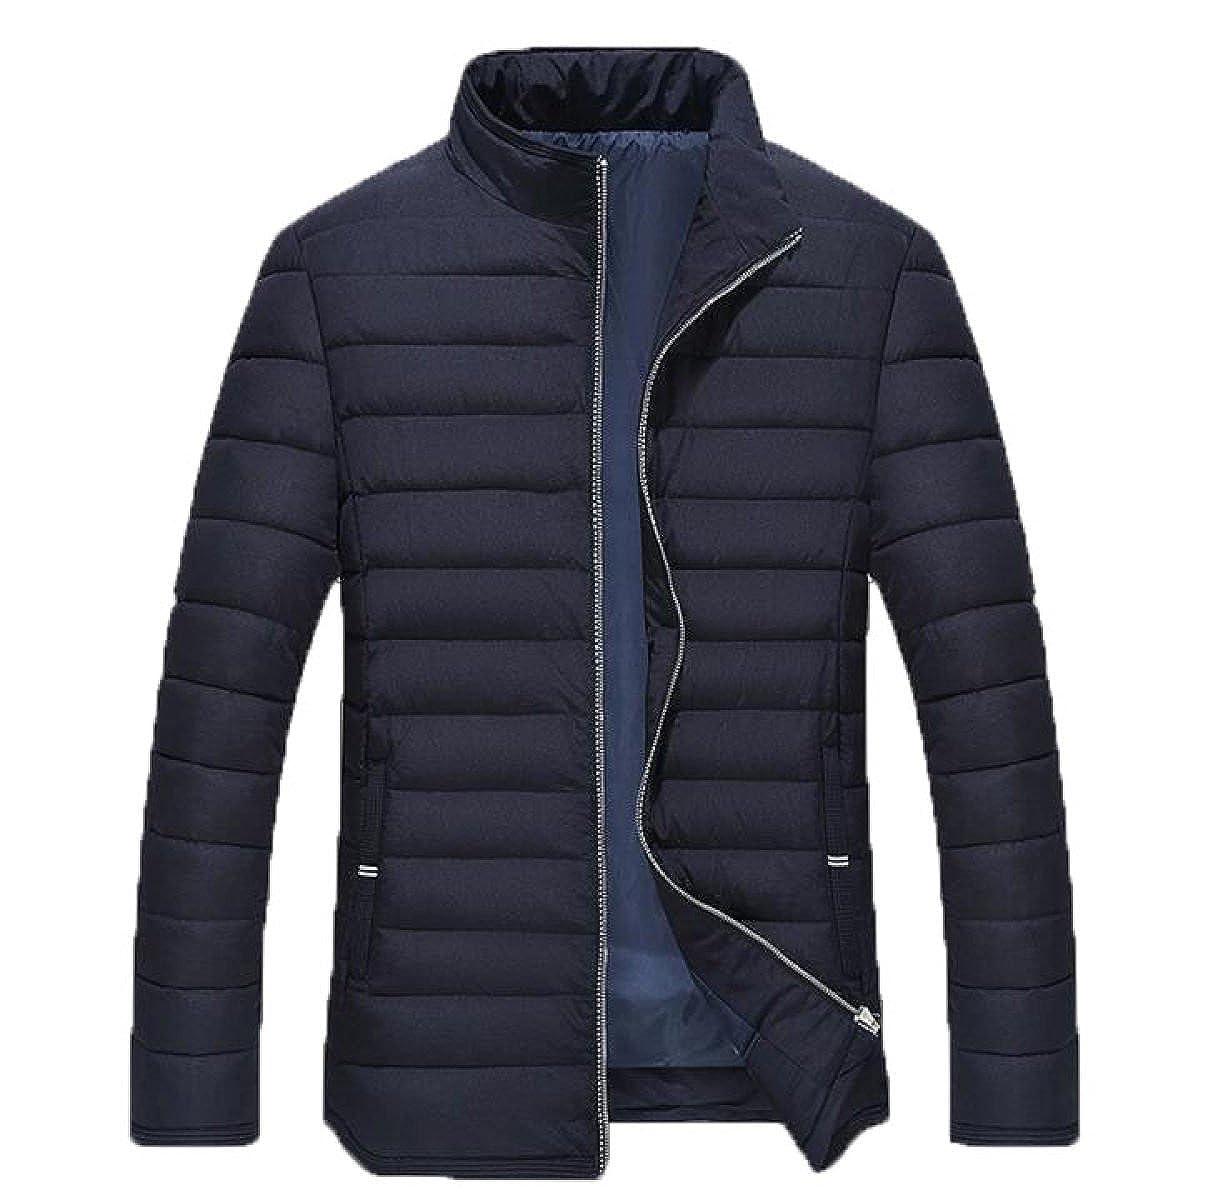 Winter Cold Warm Men's Jacket Cotton Loose Loose Zipper Closure Cotton Jacket Coat PF56SNR Ltd